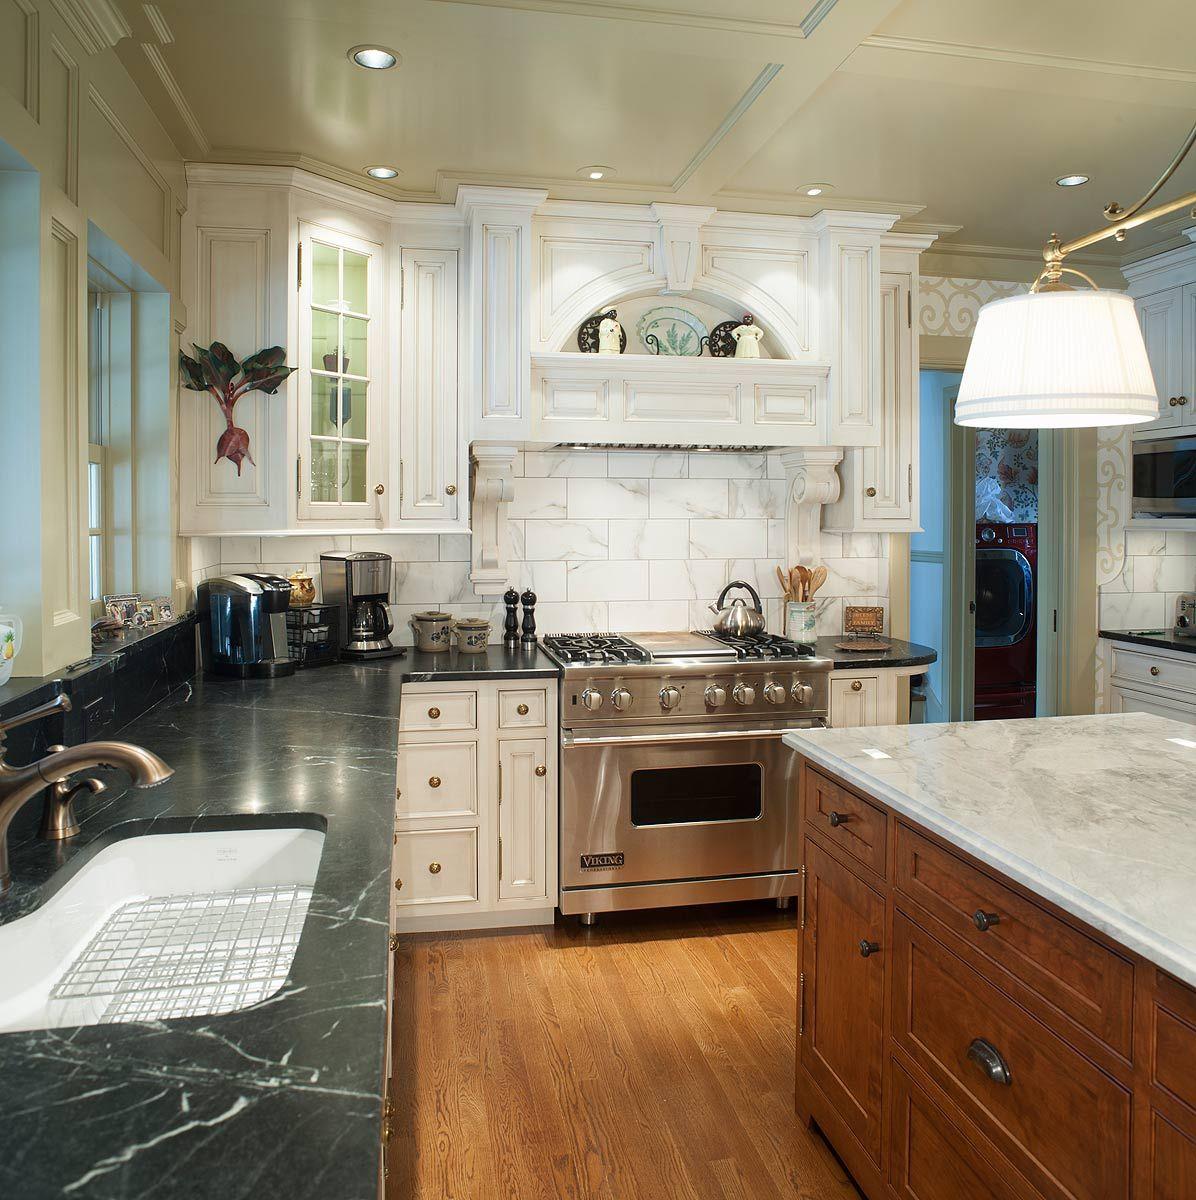 Custom Kitchen Cabinets With Soapstone Countertops Custom Kitchen Cabinets Kitchen Renovation Kitchen Design